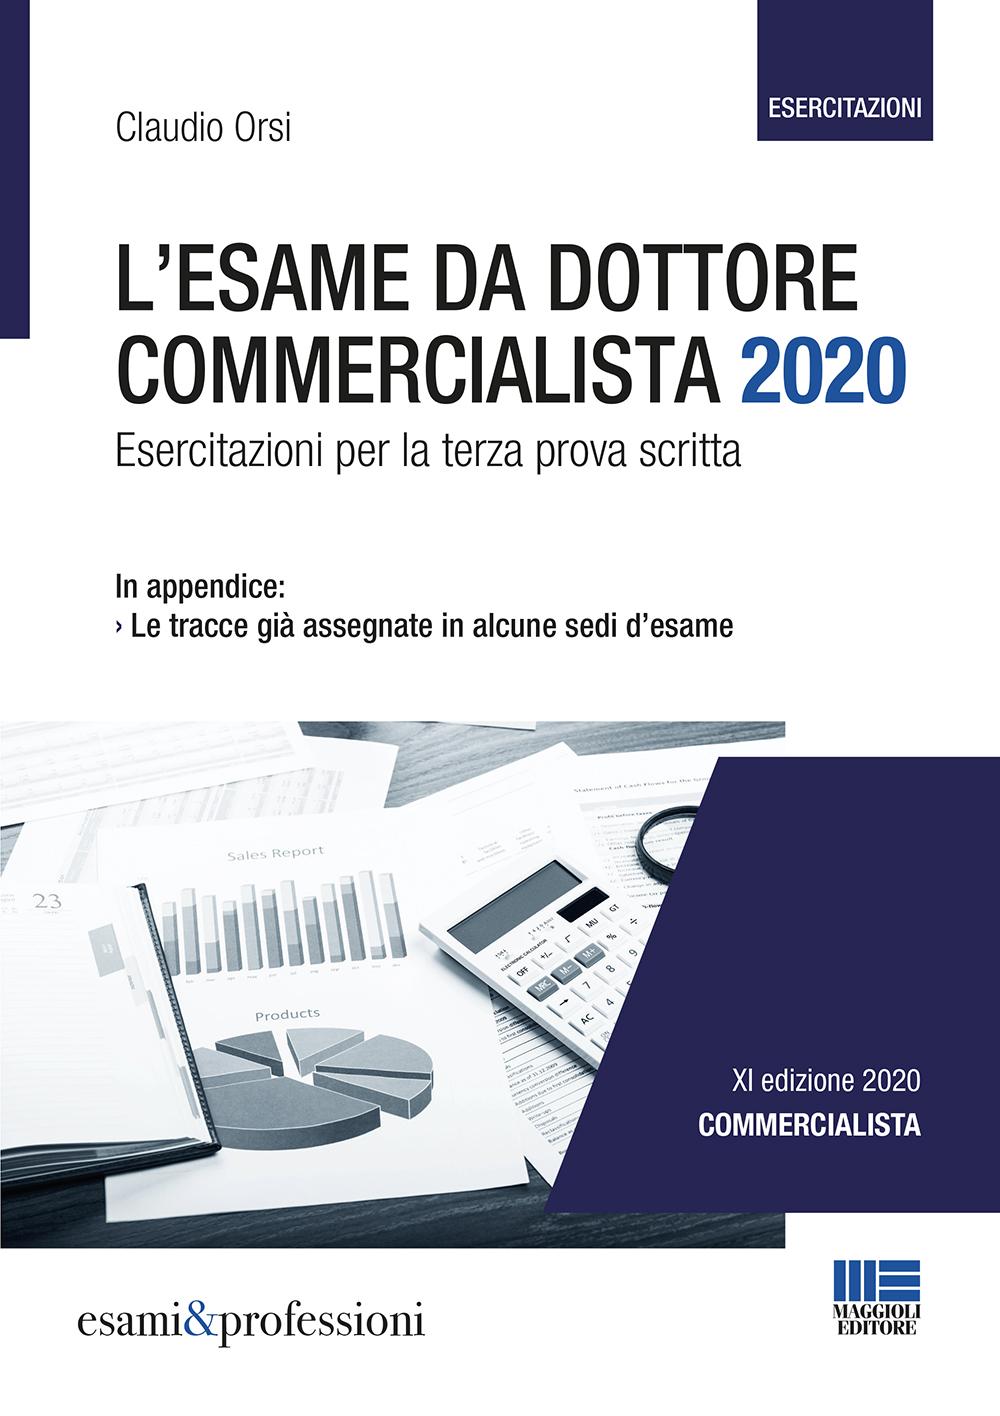 L'esame da Dottore Commercialista 2020 -Esercitazioni